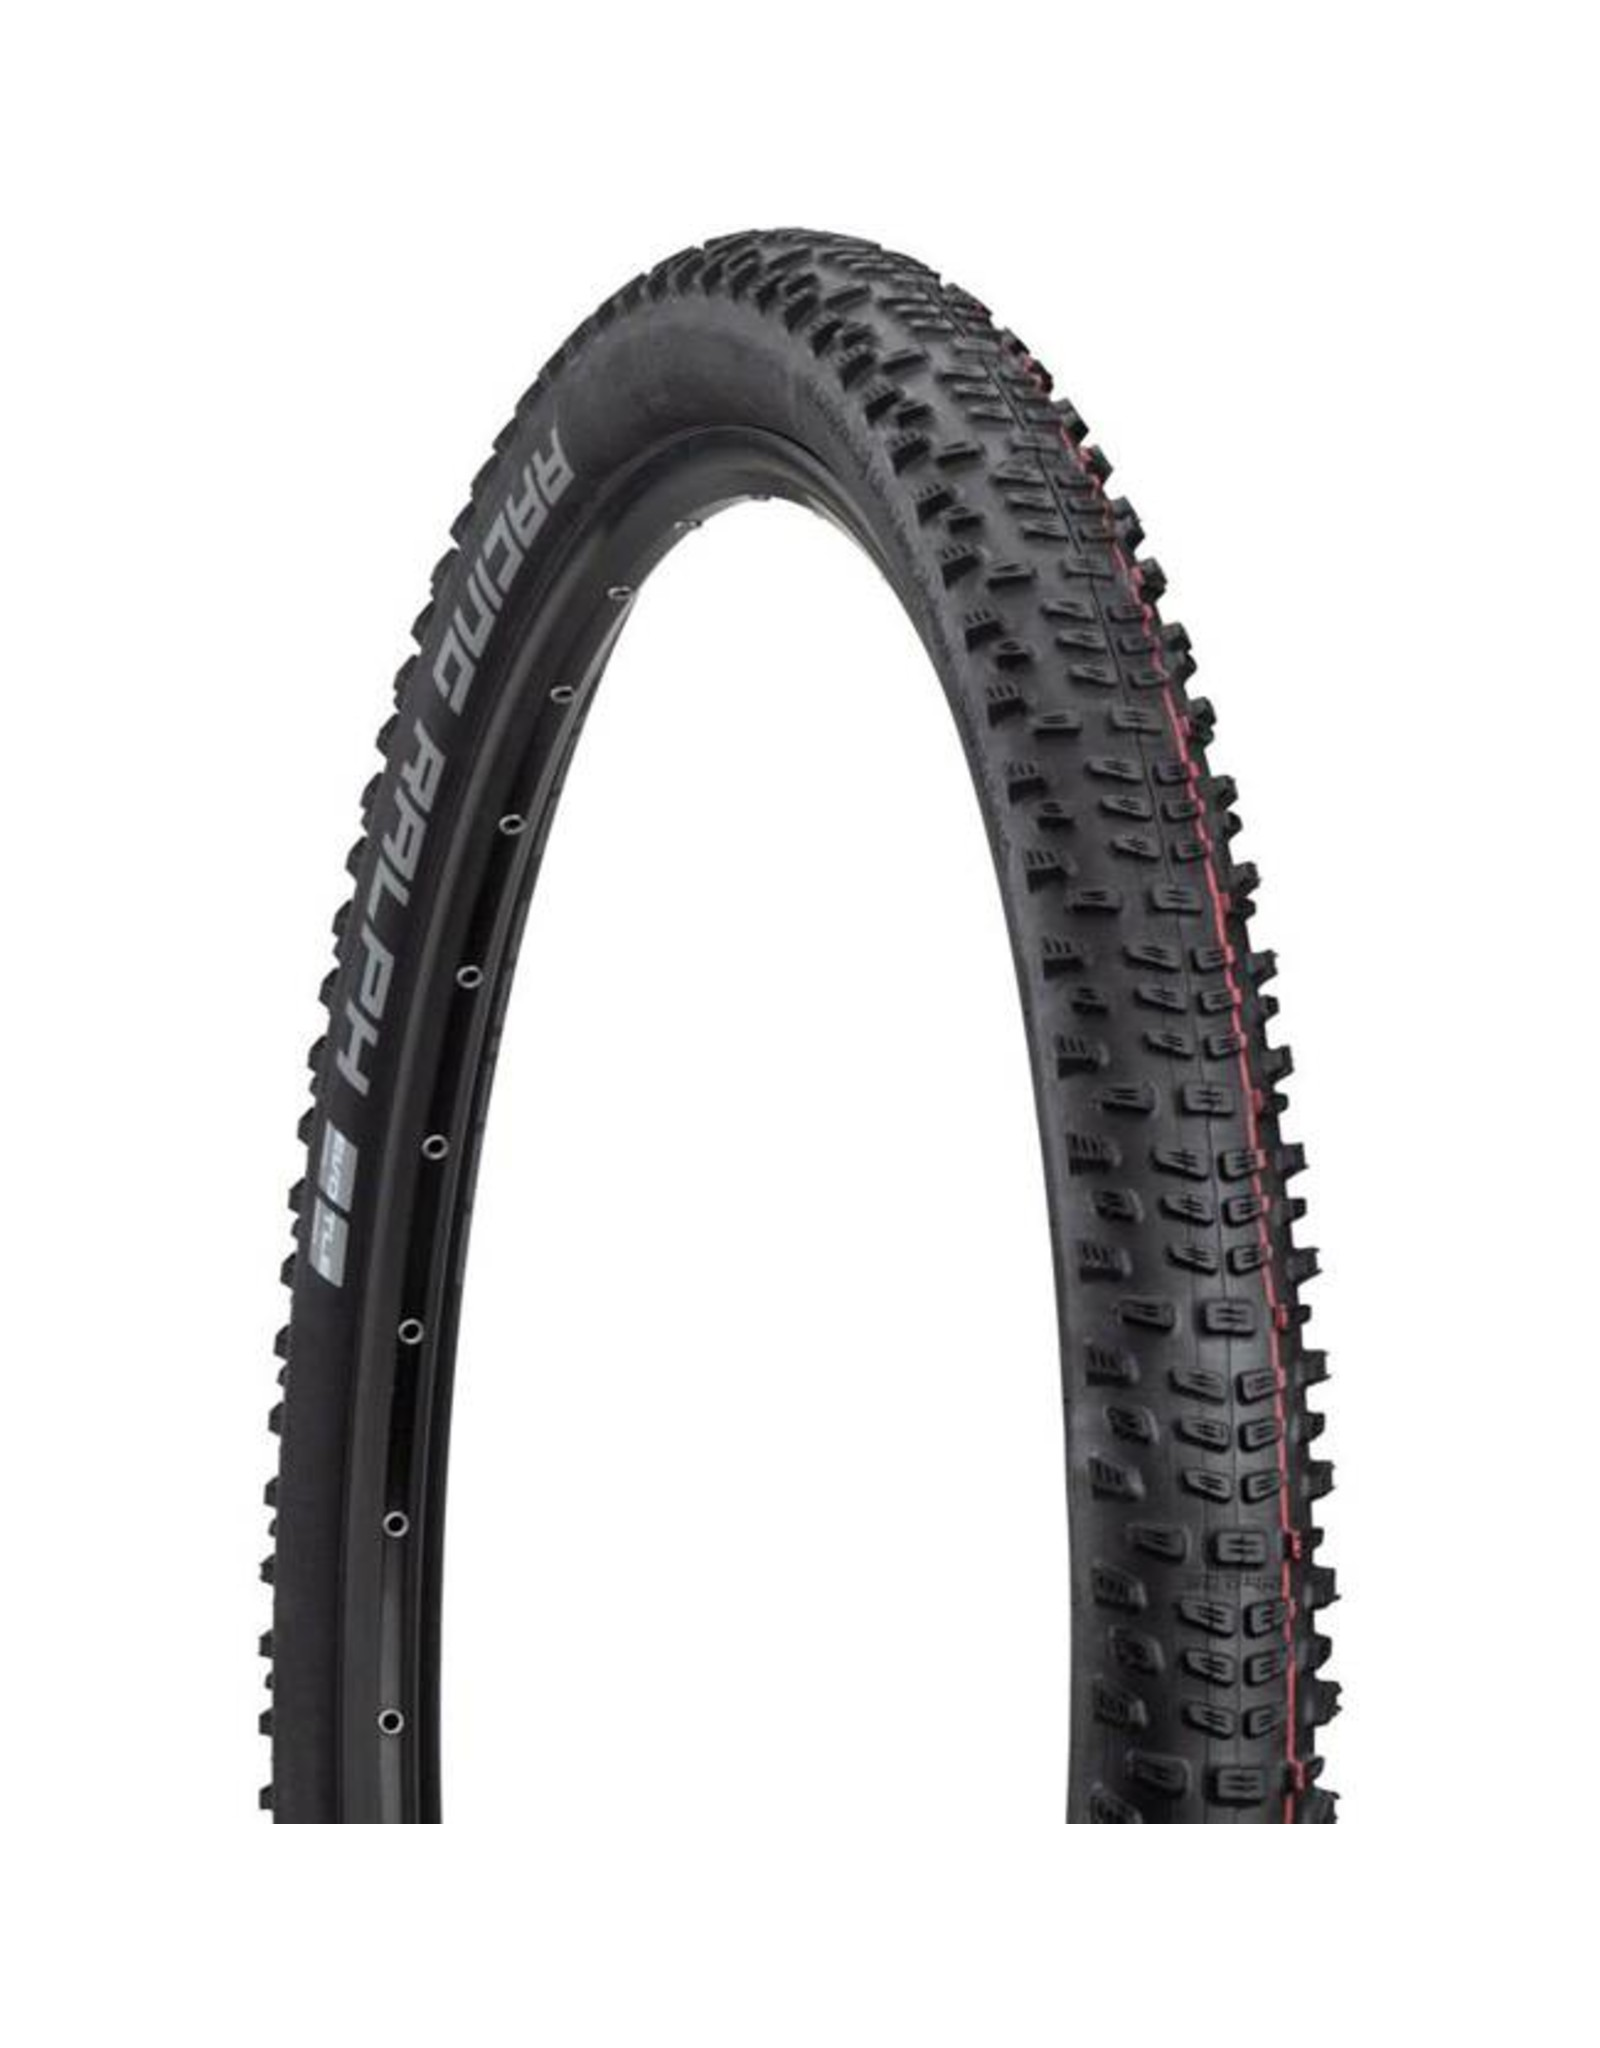 "Schwalbe Schwalbe Racing Ralph Tire: 29 x 2.25"", Folding Bead, Evolution Line, Addix Speed Compound, SnakeSkin, Tubeless Easy, Black"